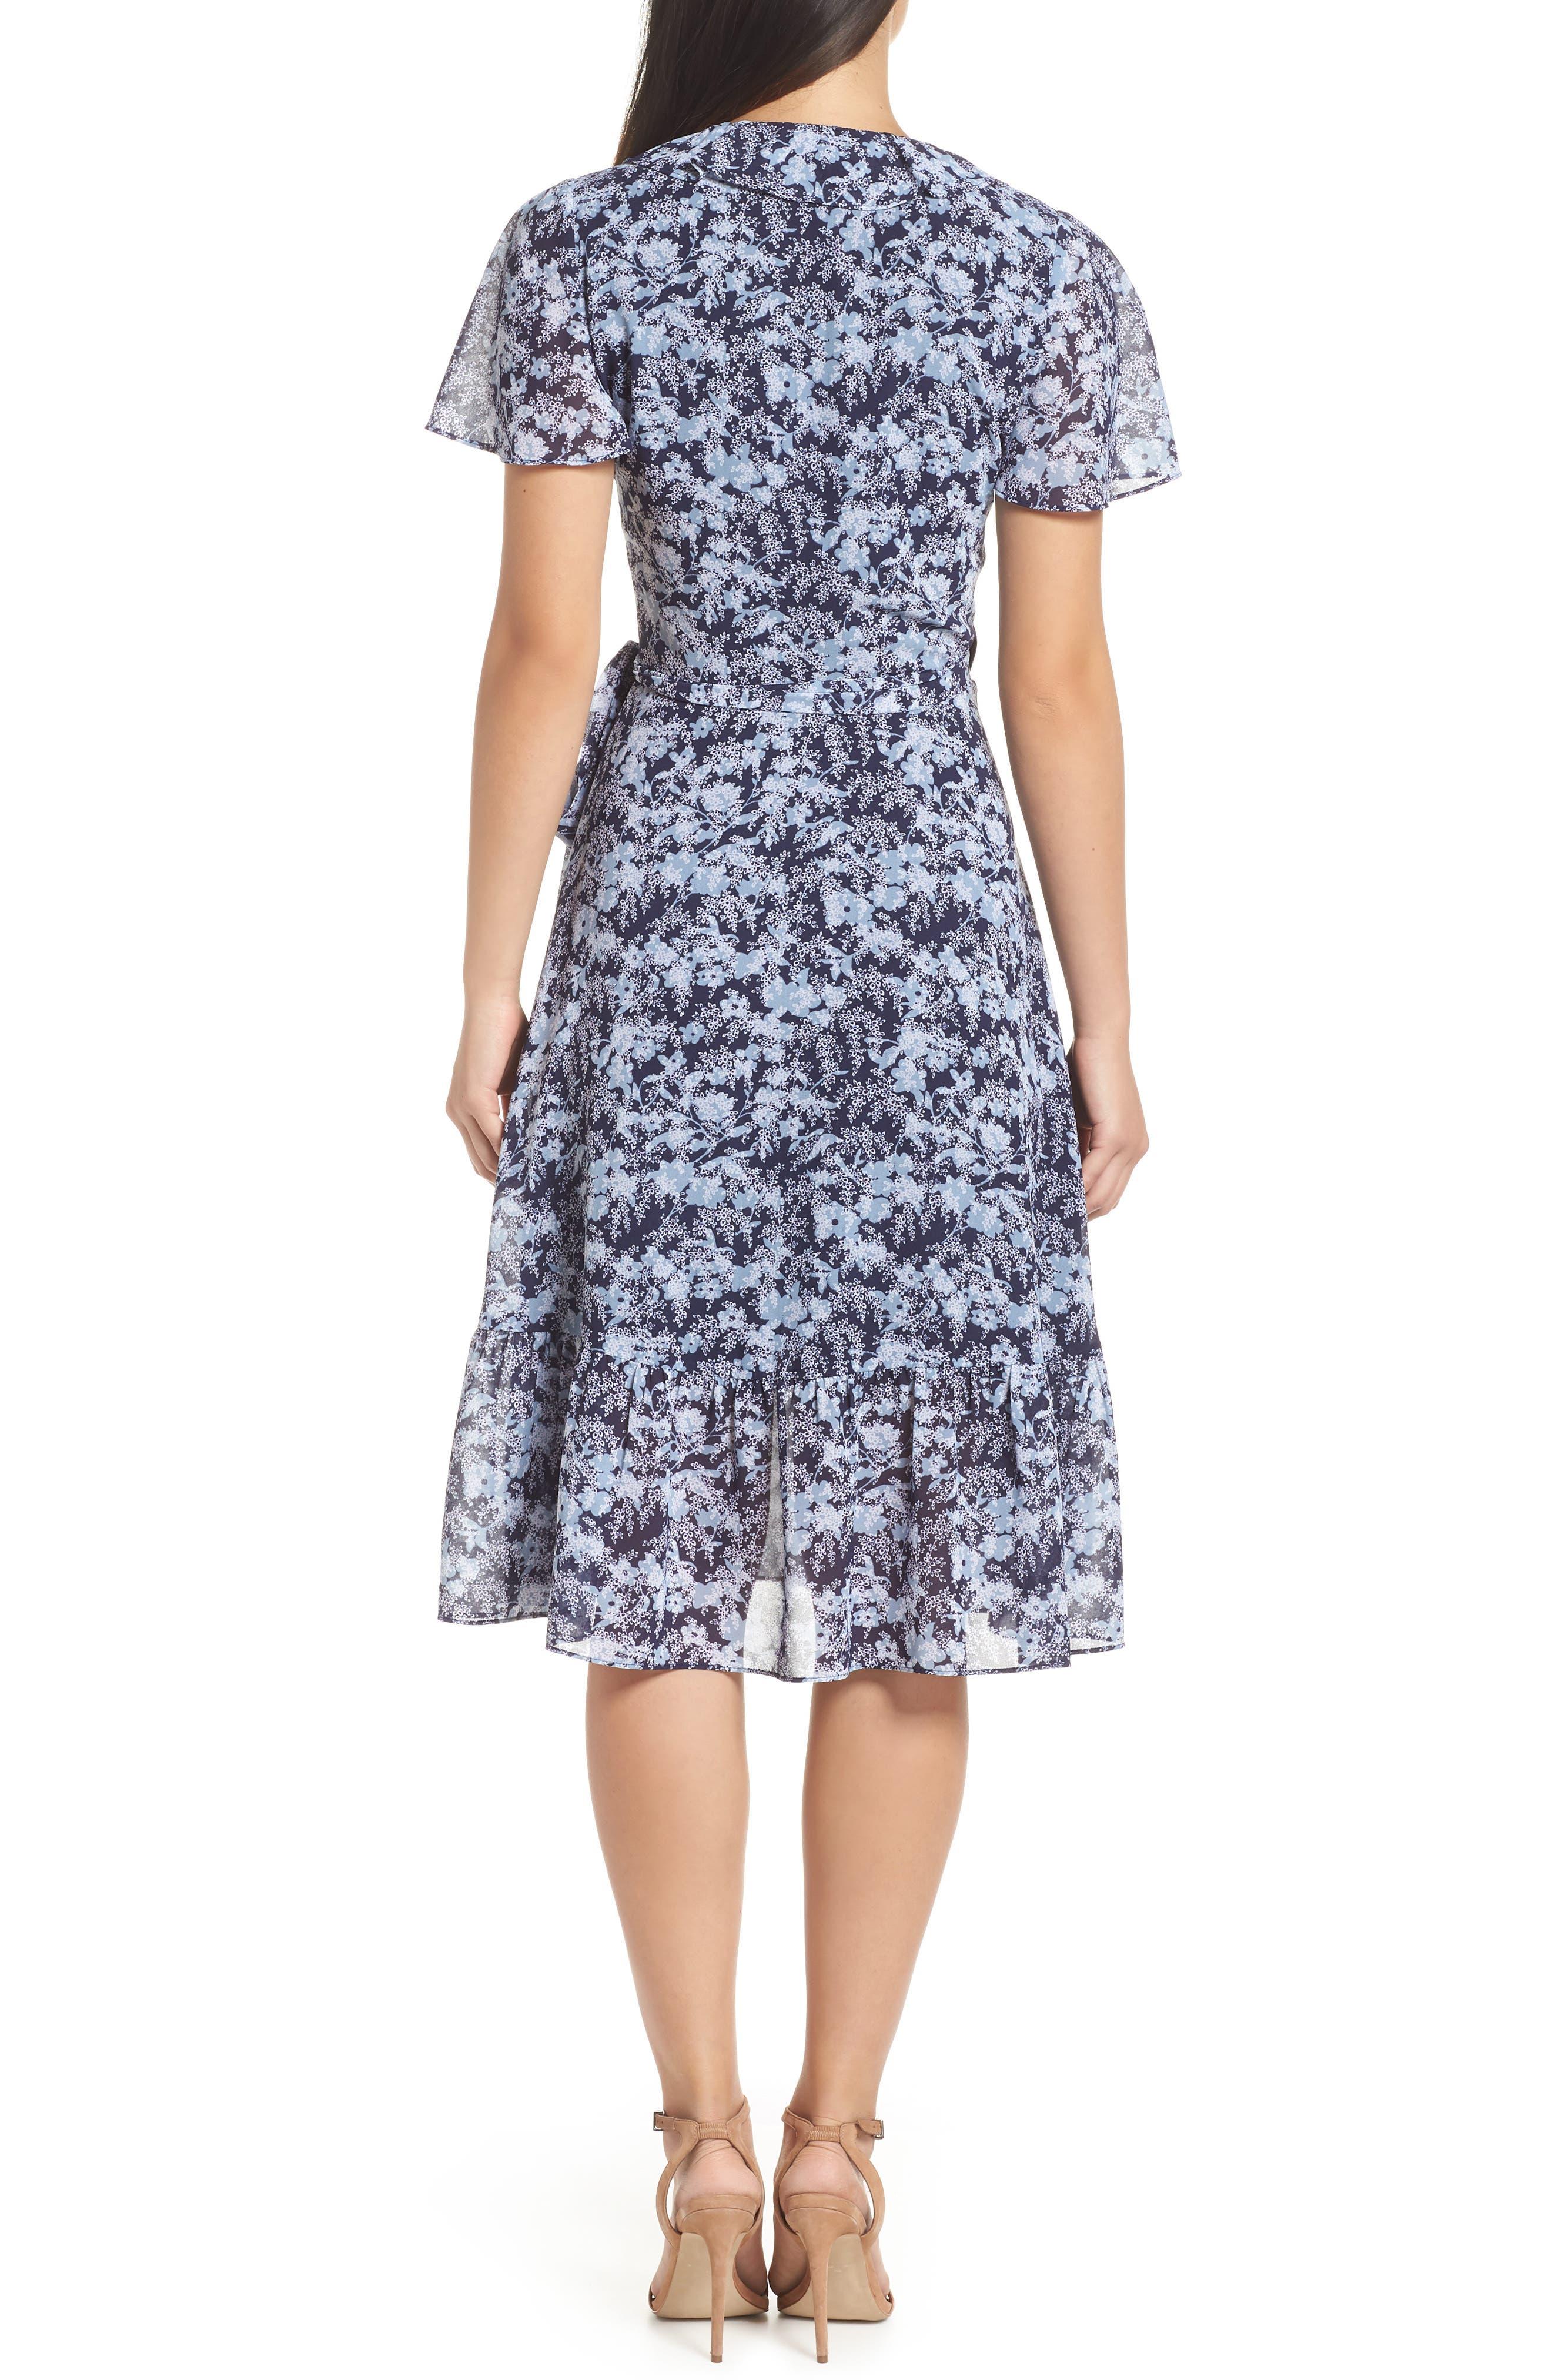 MICHAEL MICHAEL KORS, Ruffle Wrap Dress, Alternate thumbnail 2, color, TRUE NAVY/CHAMBRAY